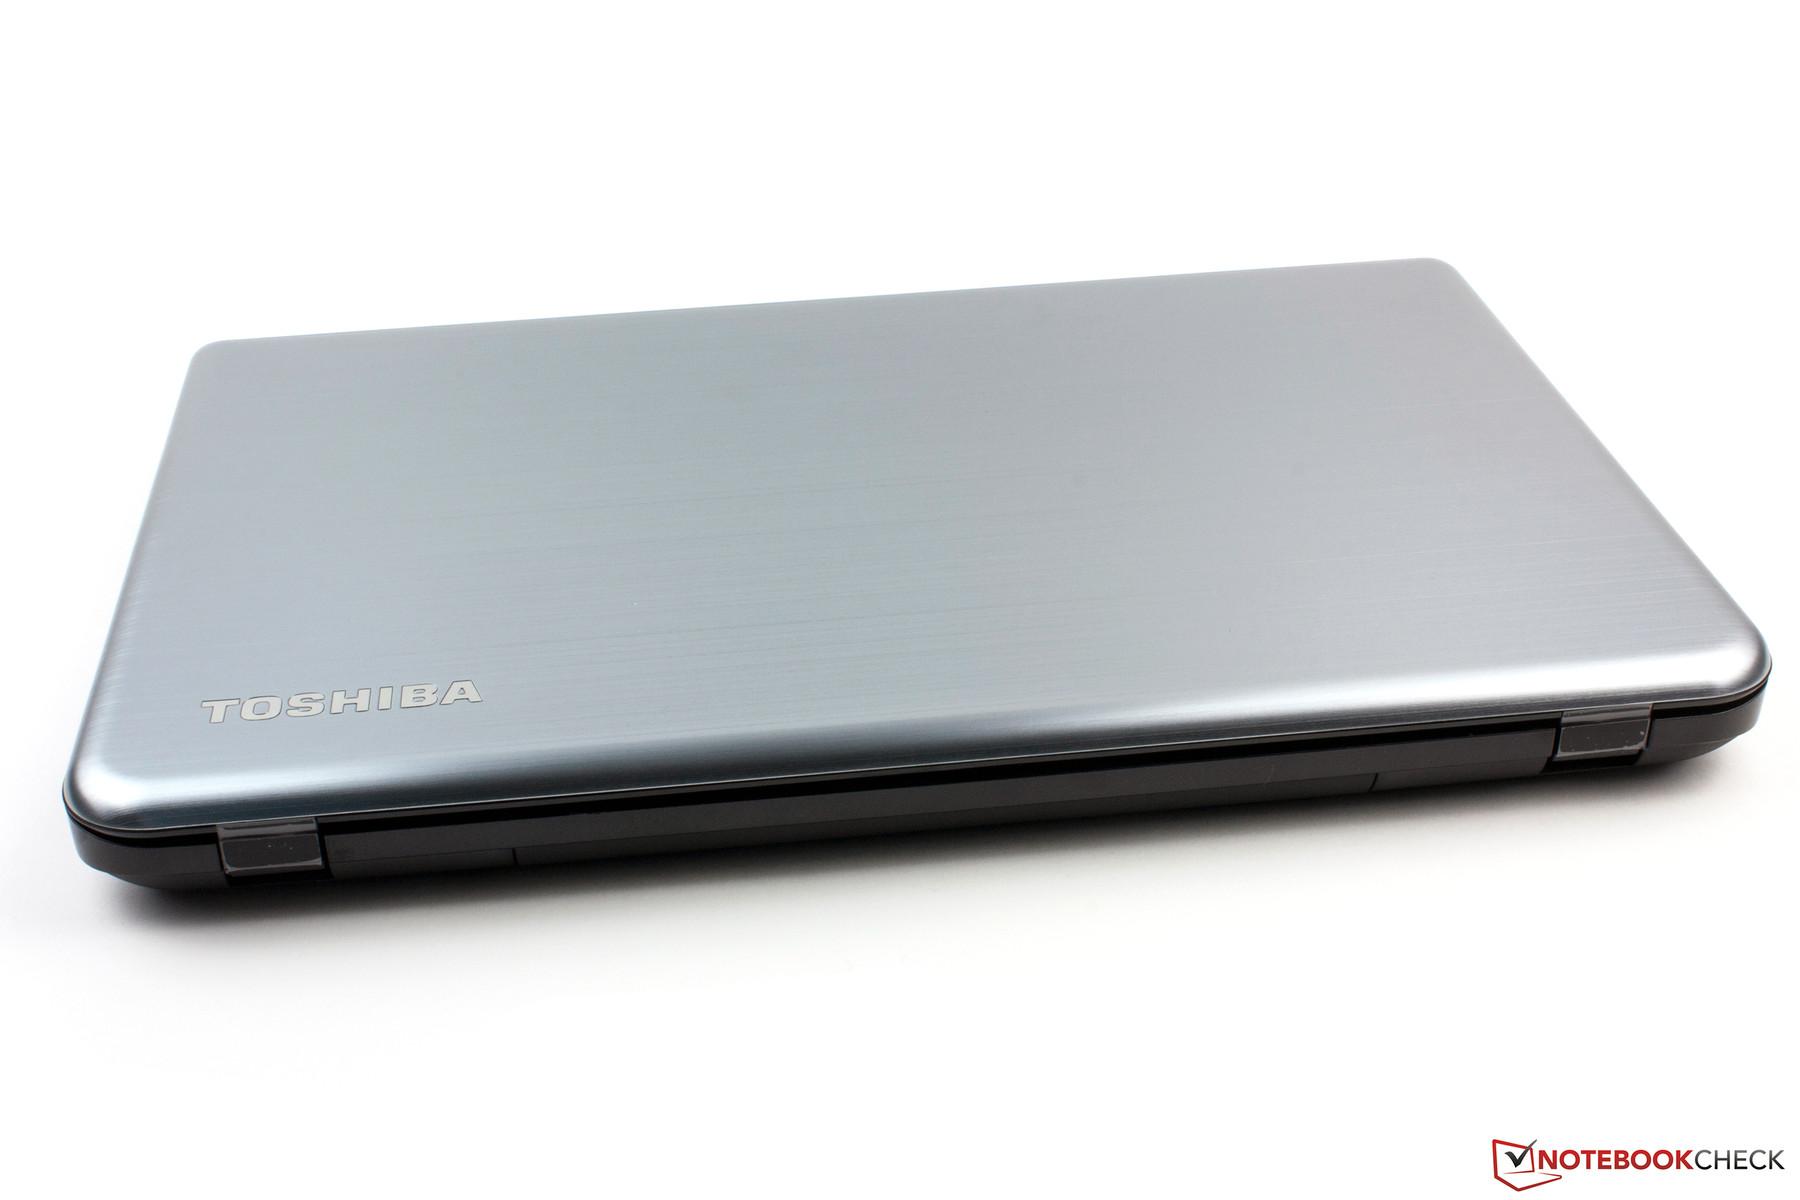 New Drivers: Toshiba Satellite S70